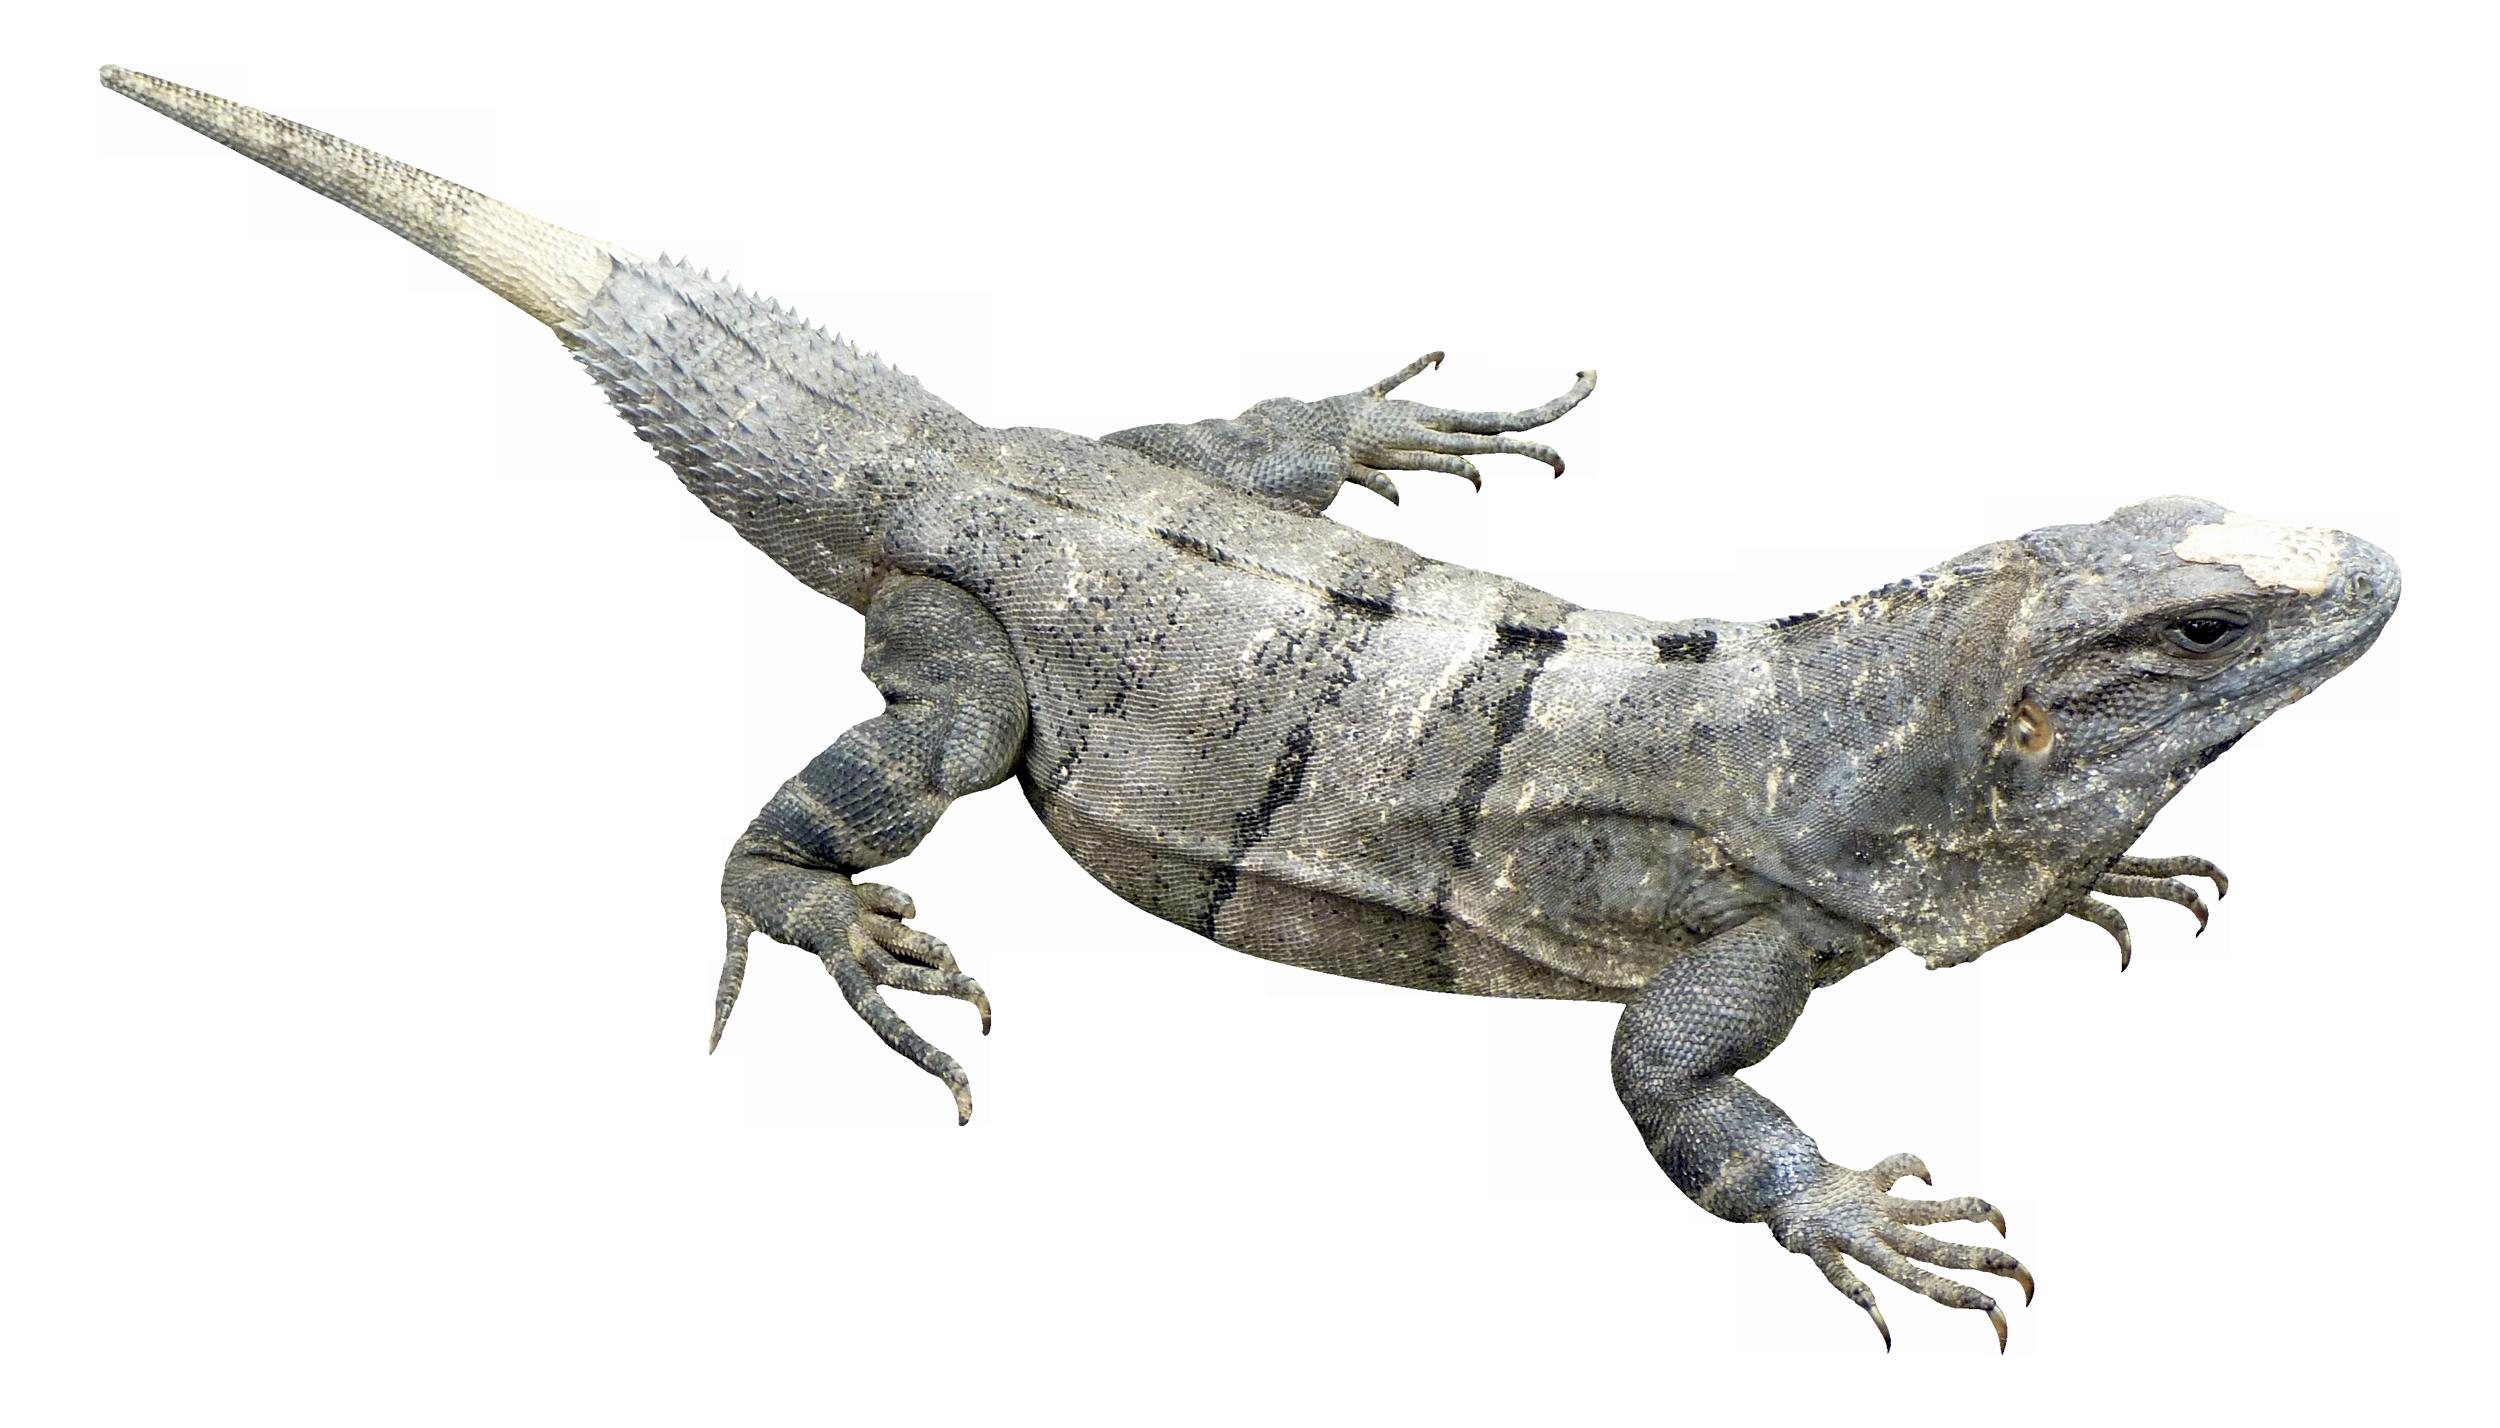 Iguana PNG - 23354